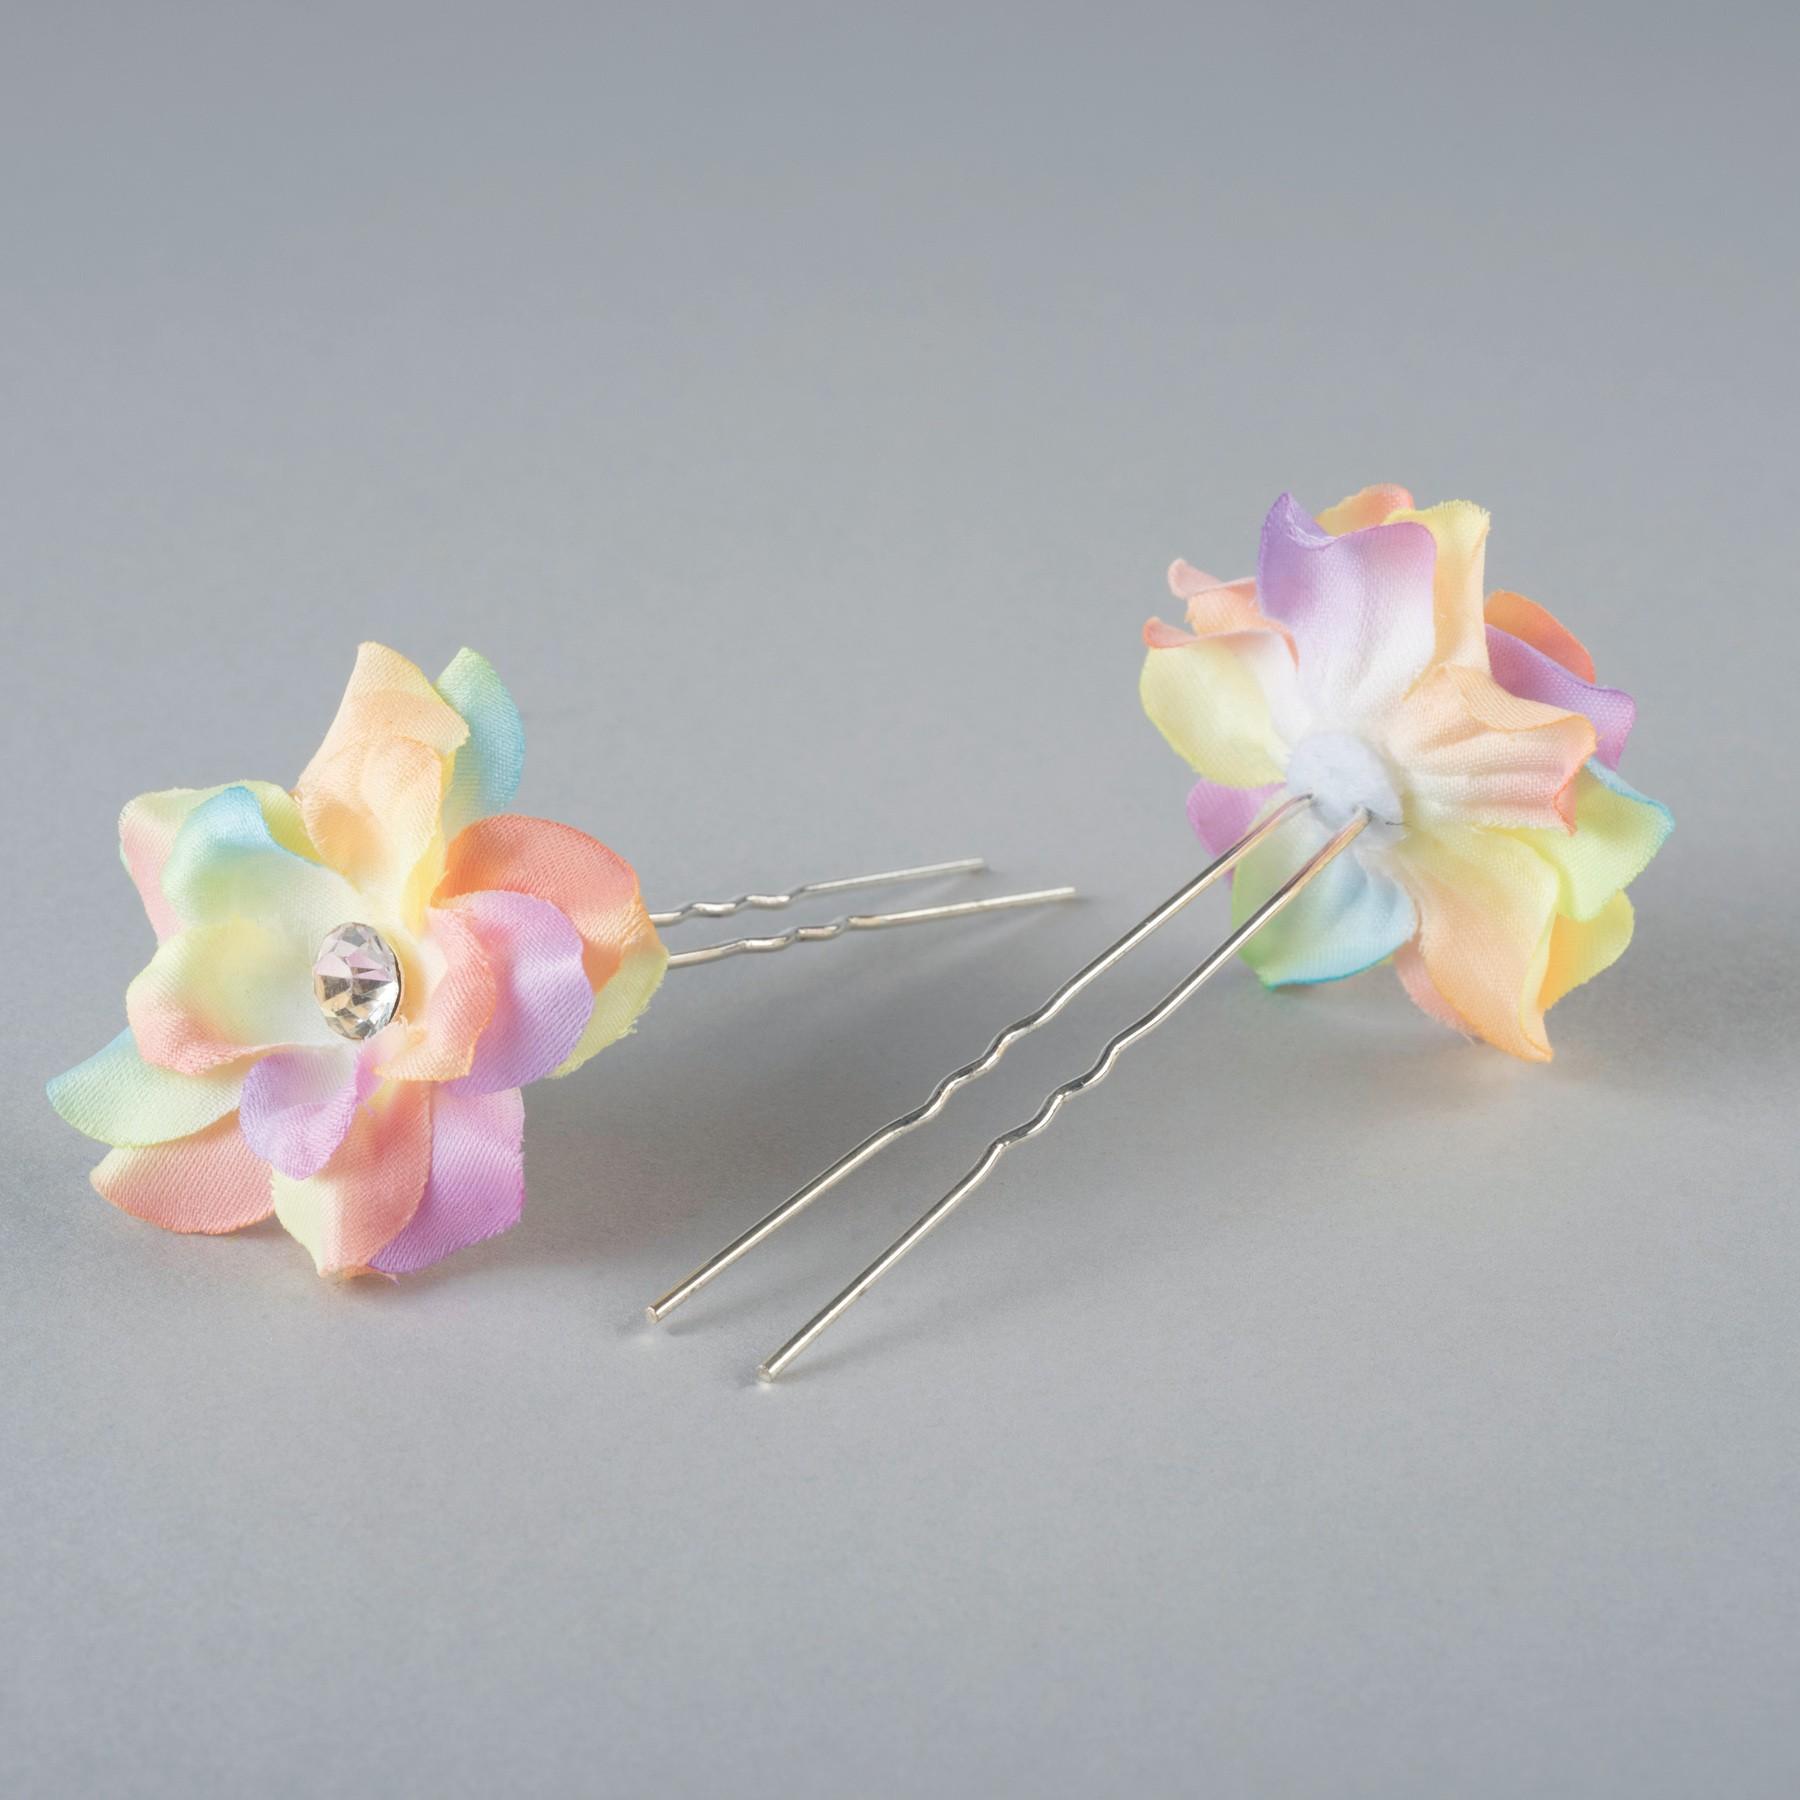 Fabric Flower Hairpins Pair Rainbow